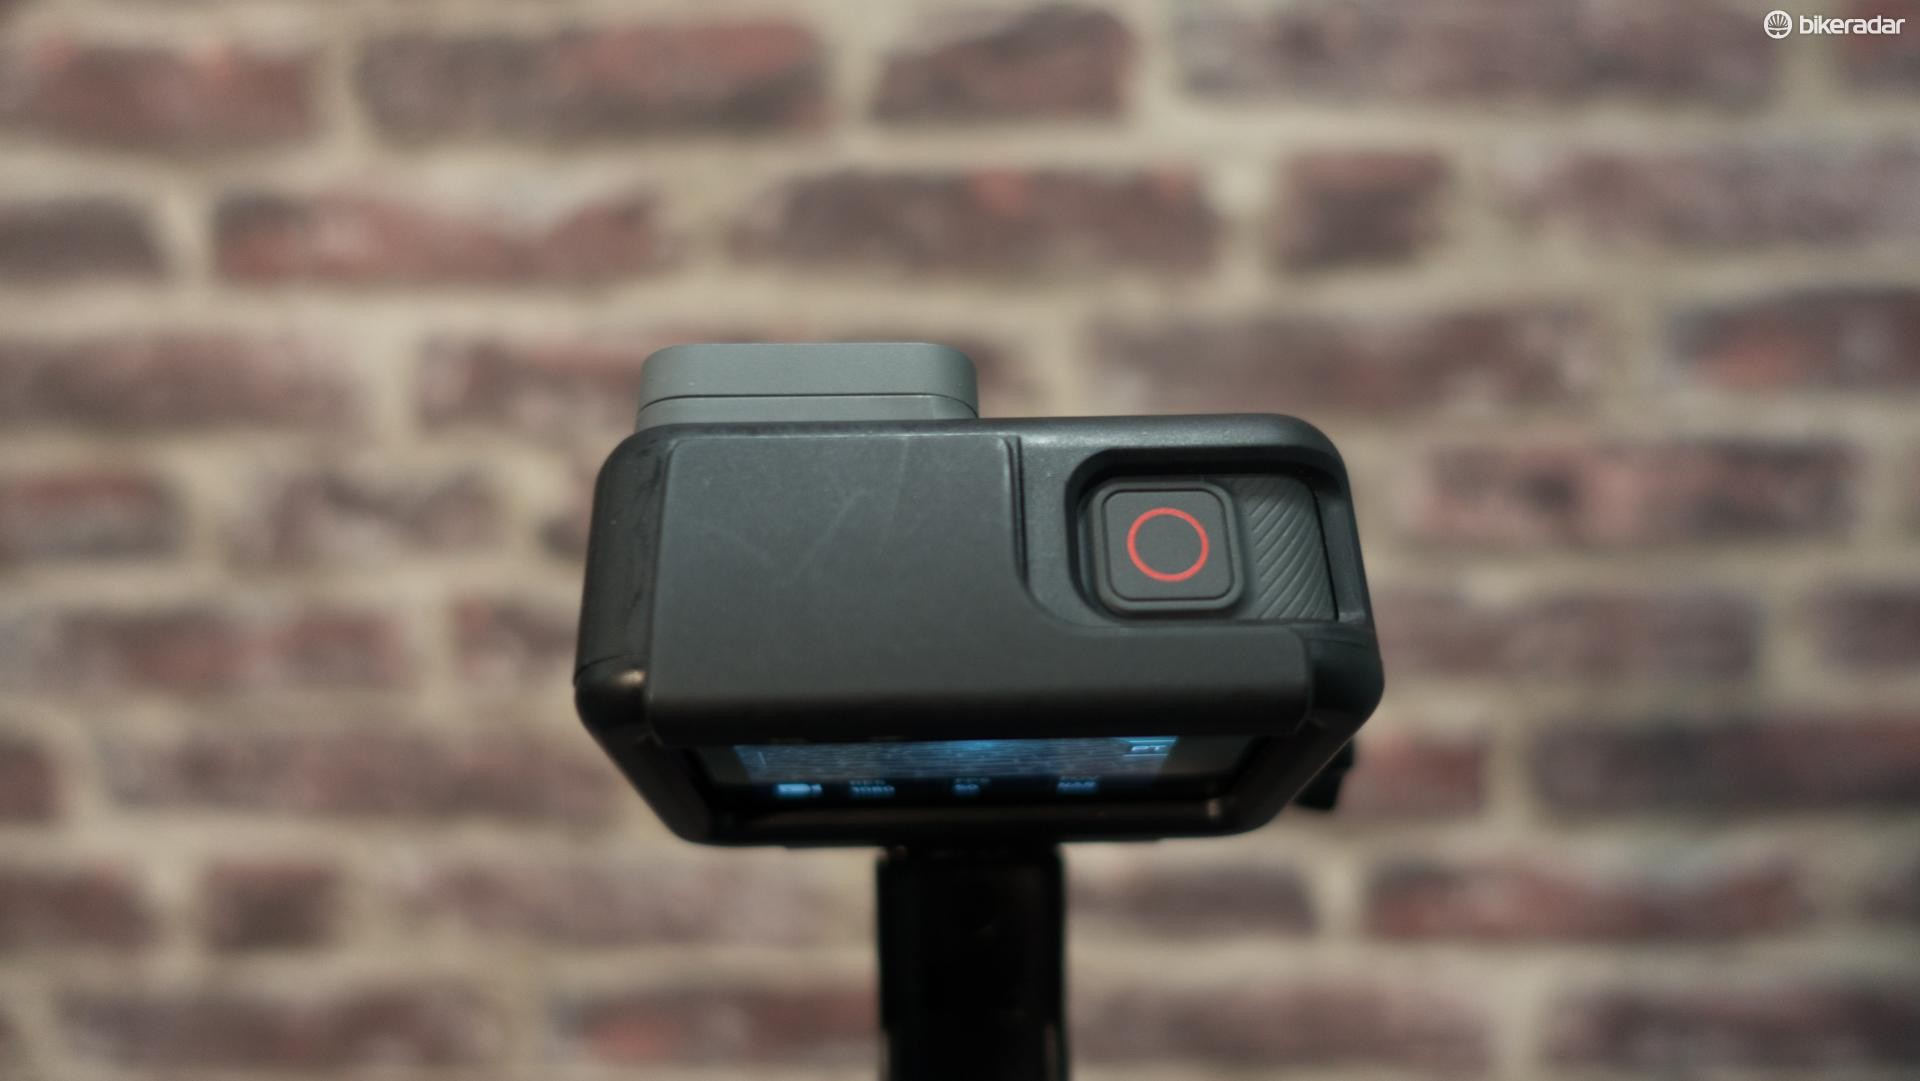 GoPro Hero 5 Black vs Hero 5 Session action cameras compared - BikeRadar